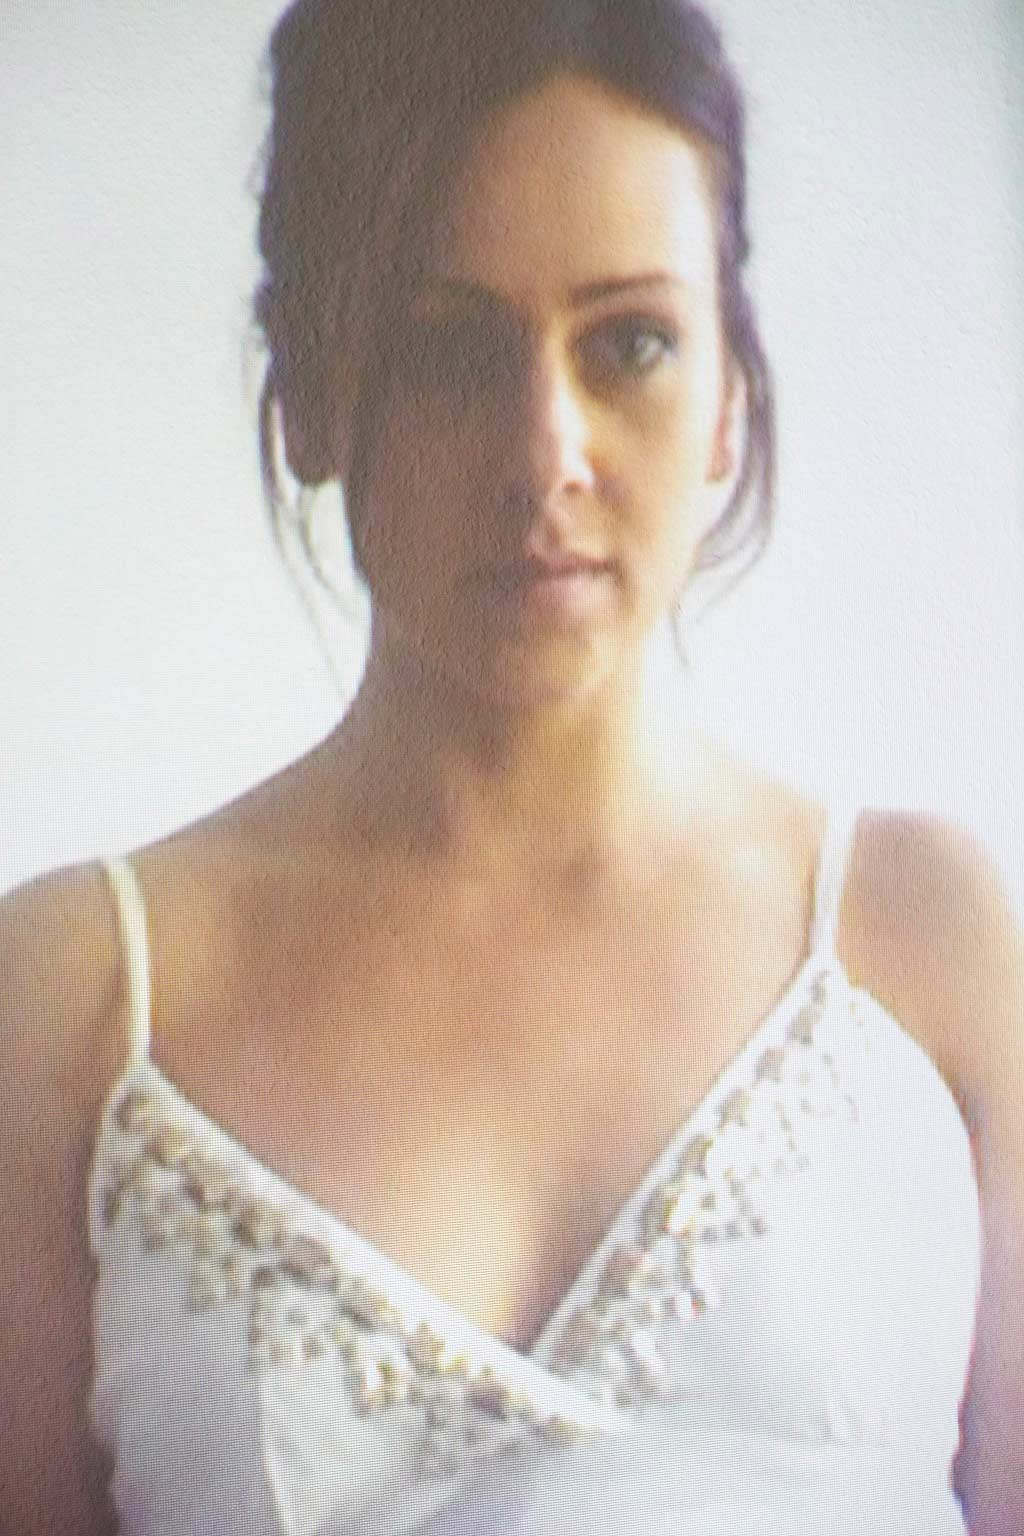 MATILDA, 29, LONDON, ENGLAND matildatandandand28